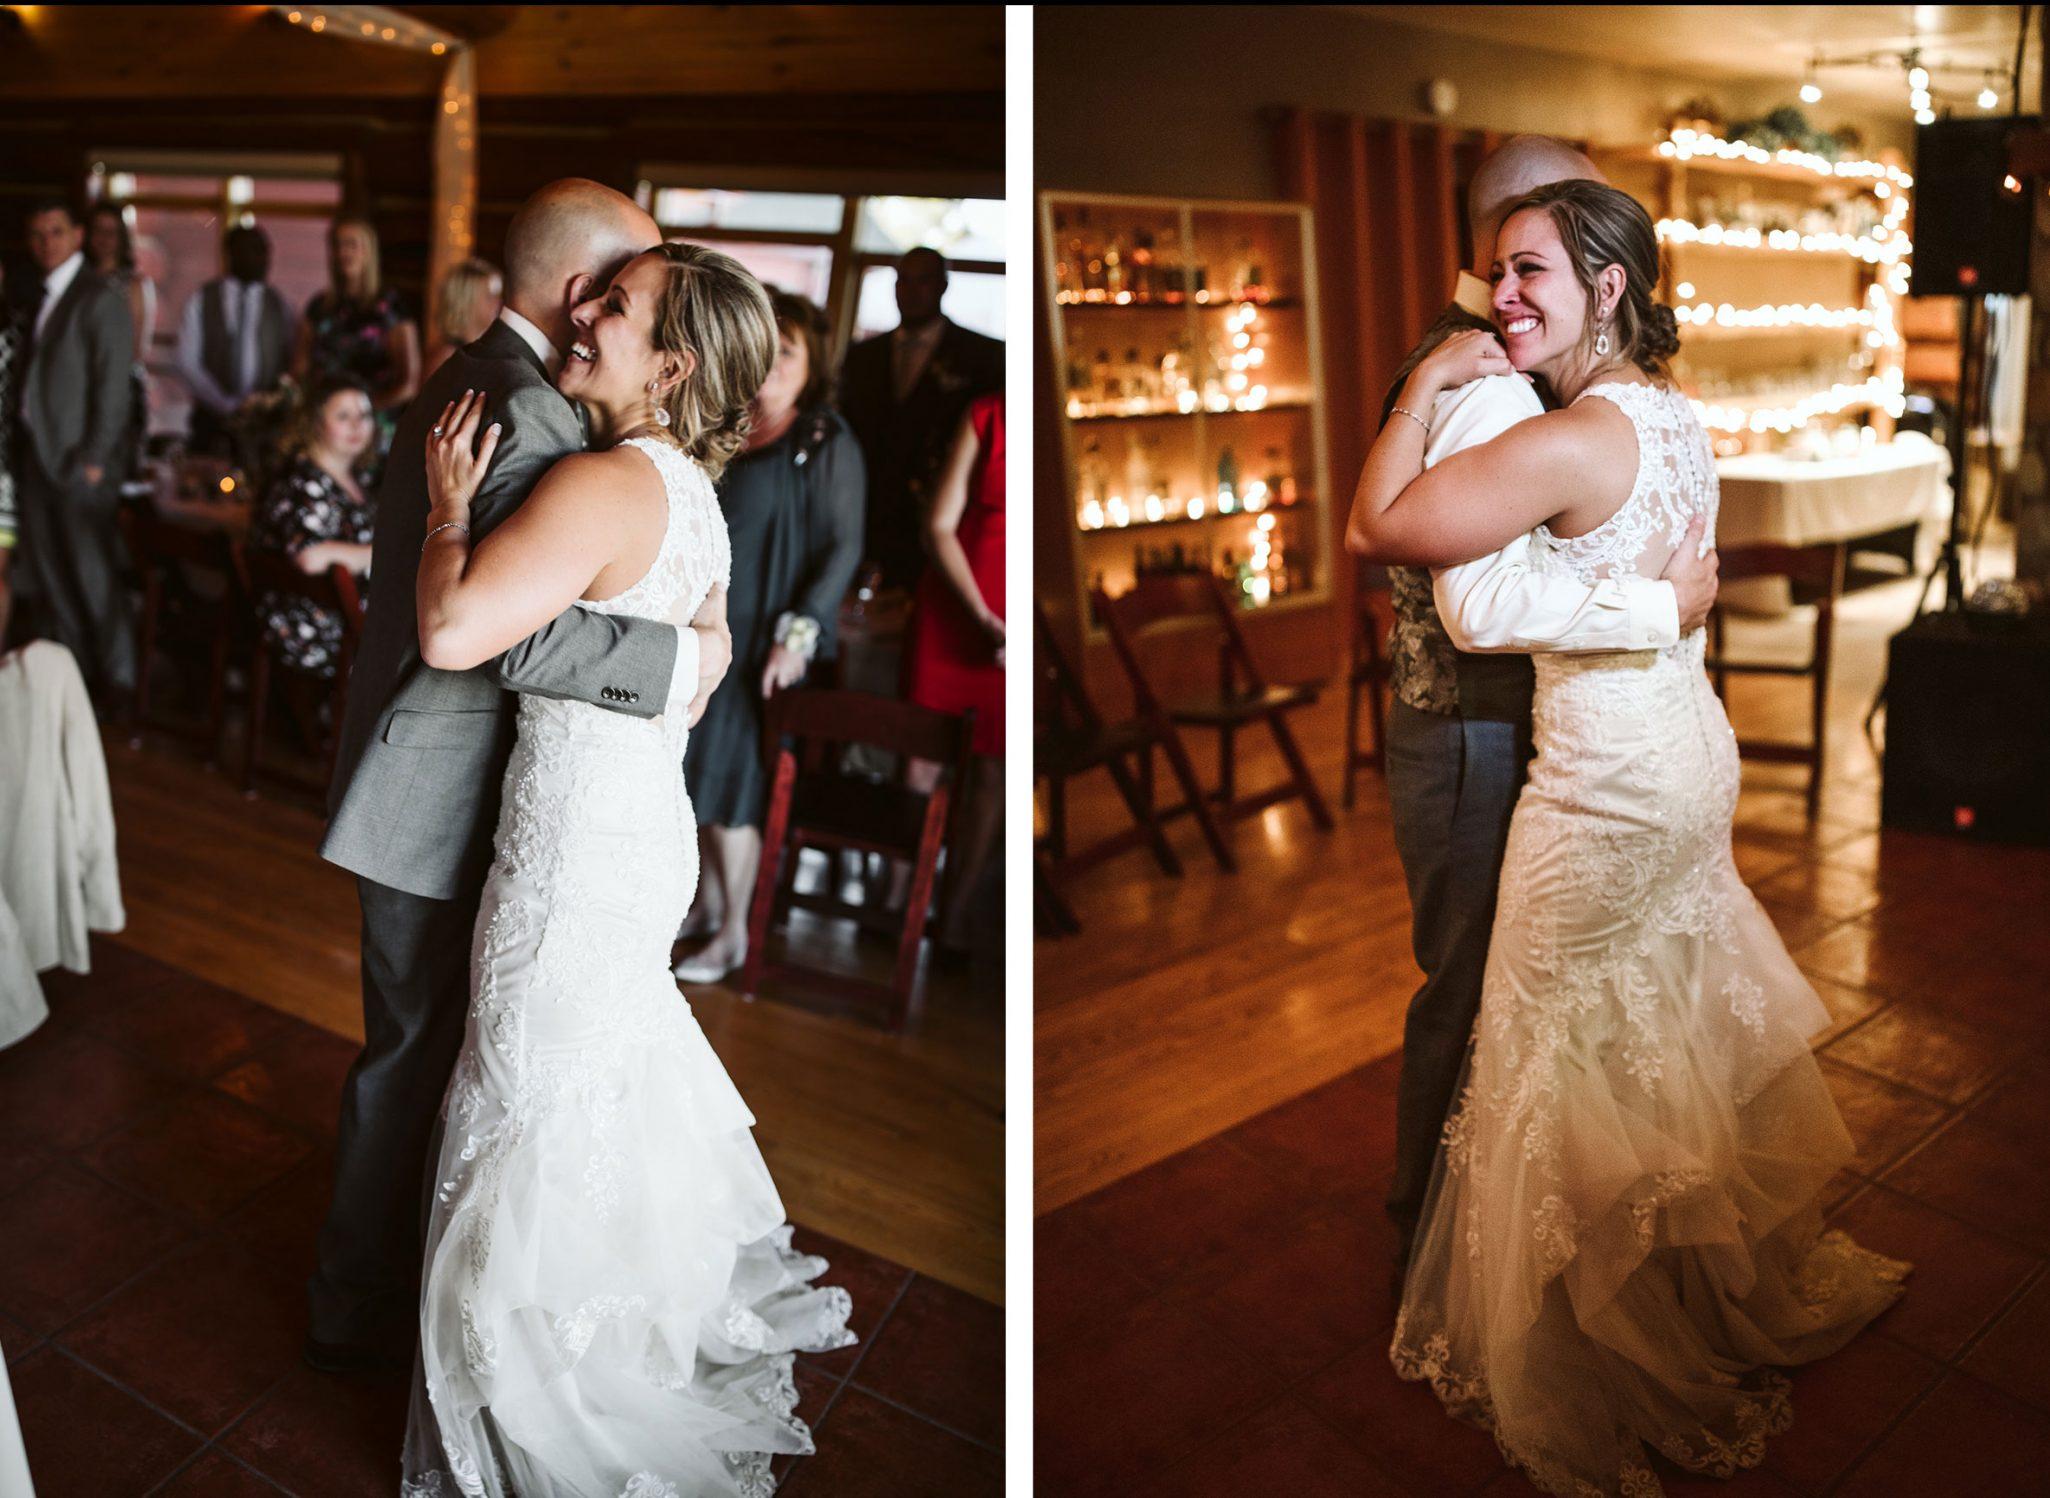 Reception dancing at Sophia Retreat Center | Durango Weddings Magazine